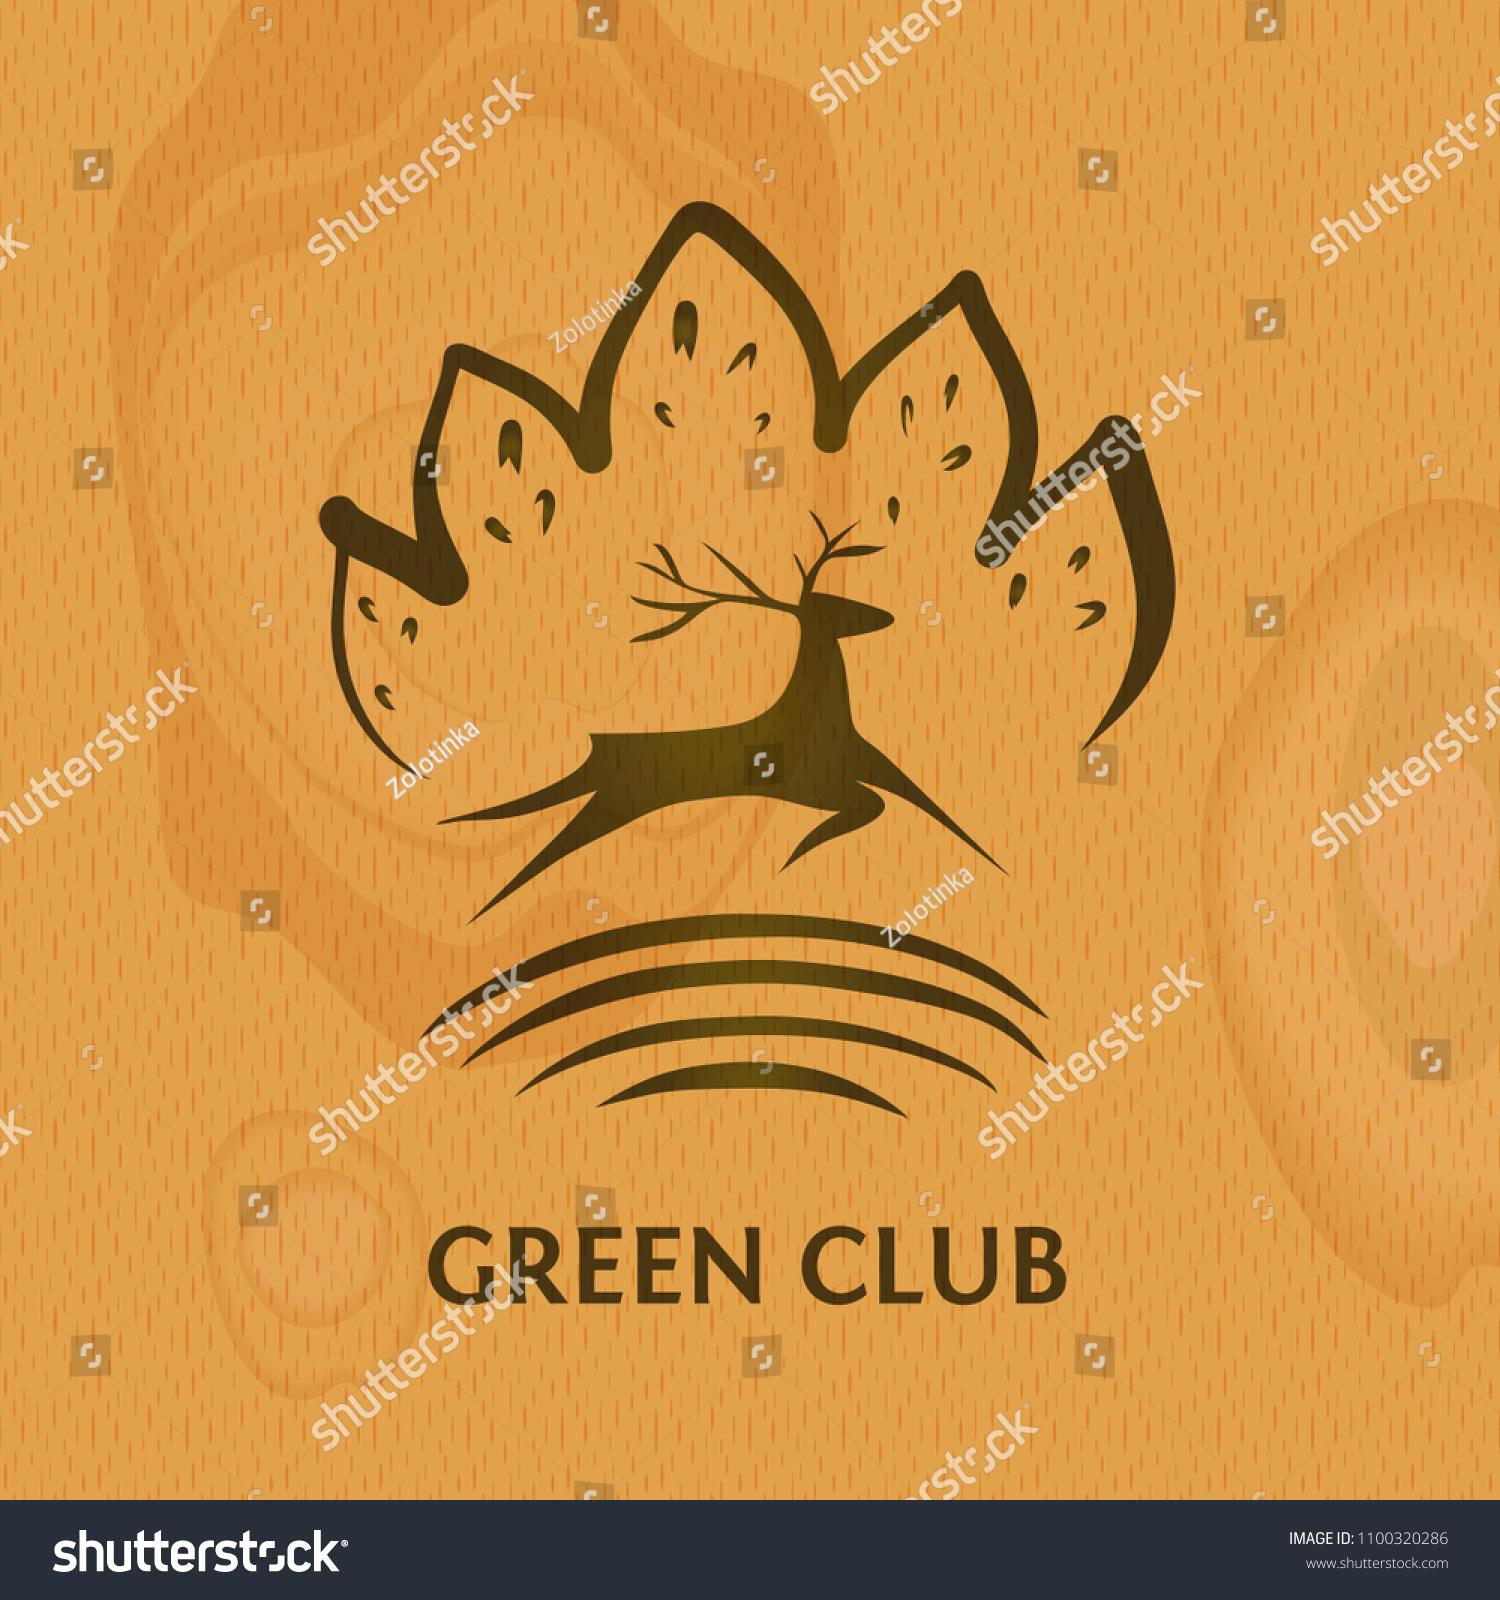 Green Club Logo Silhouette Deer On Stock Vector Royalty Free